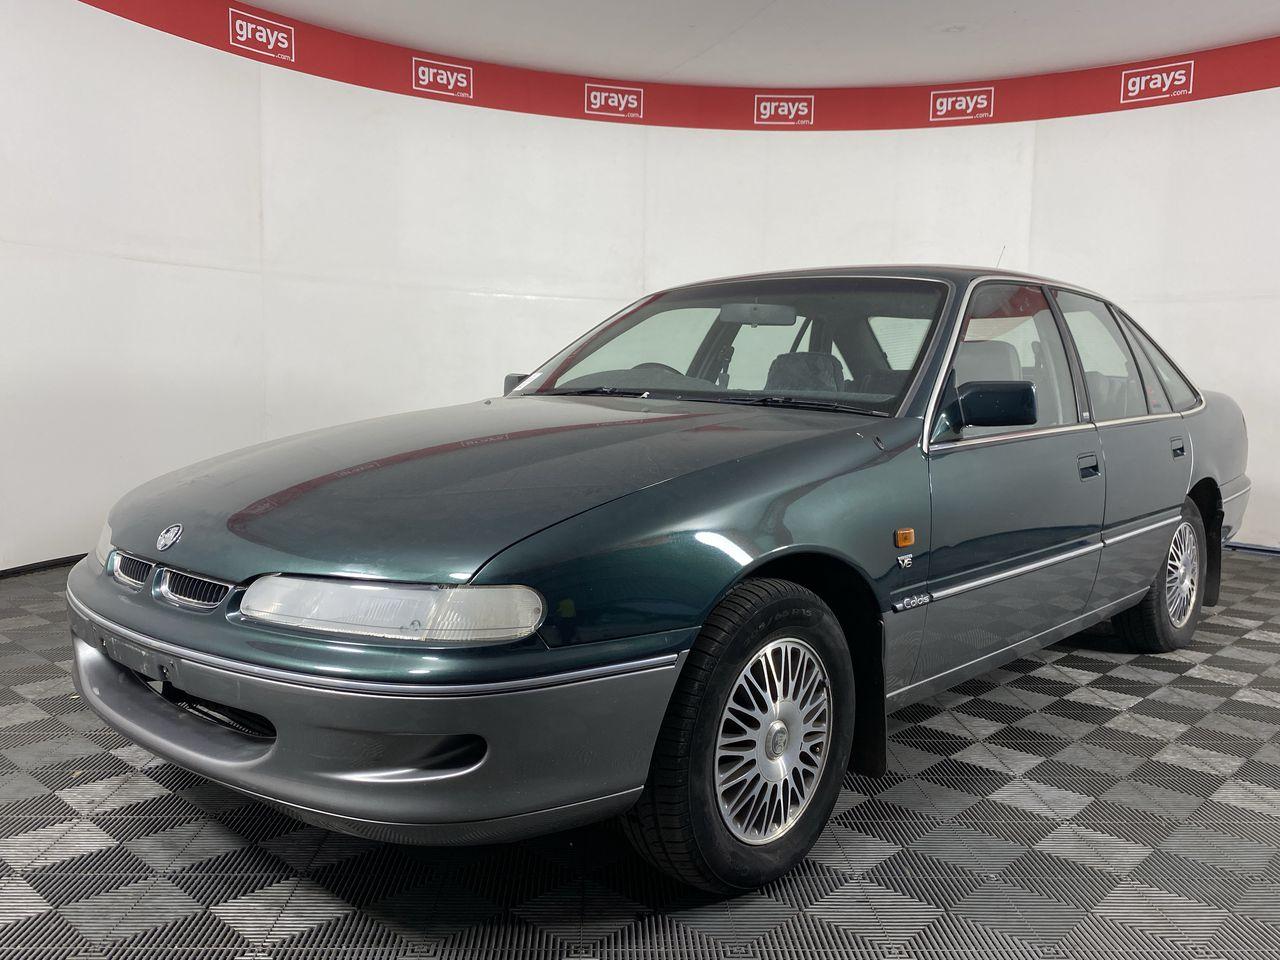 1995 Holden Calais VS Automatic Sedan